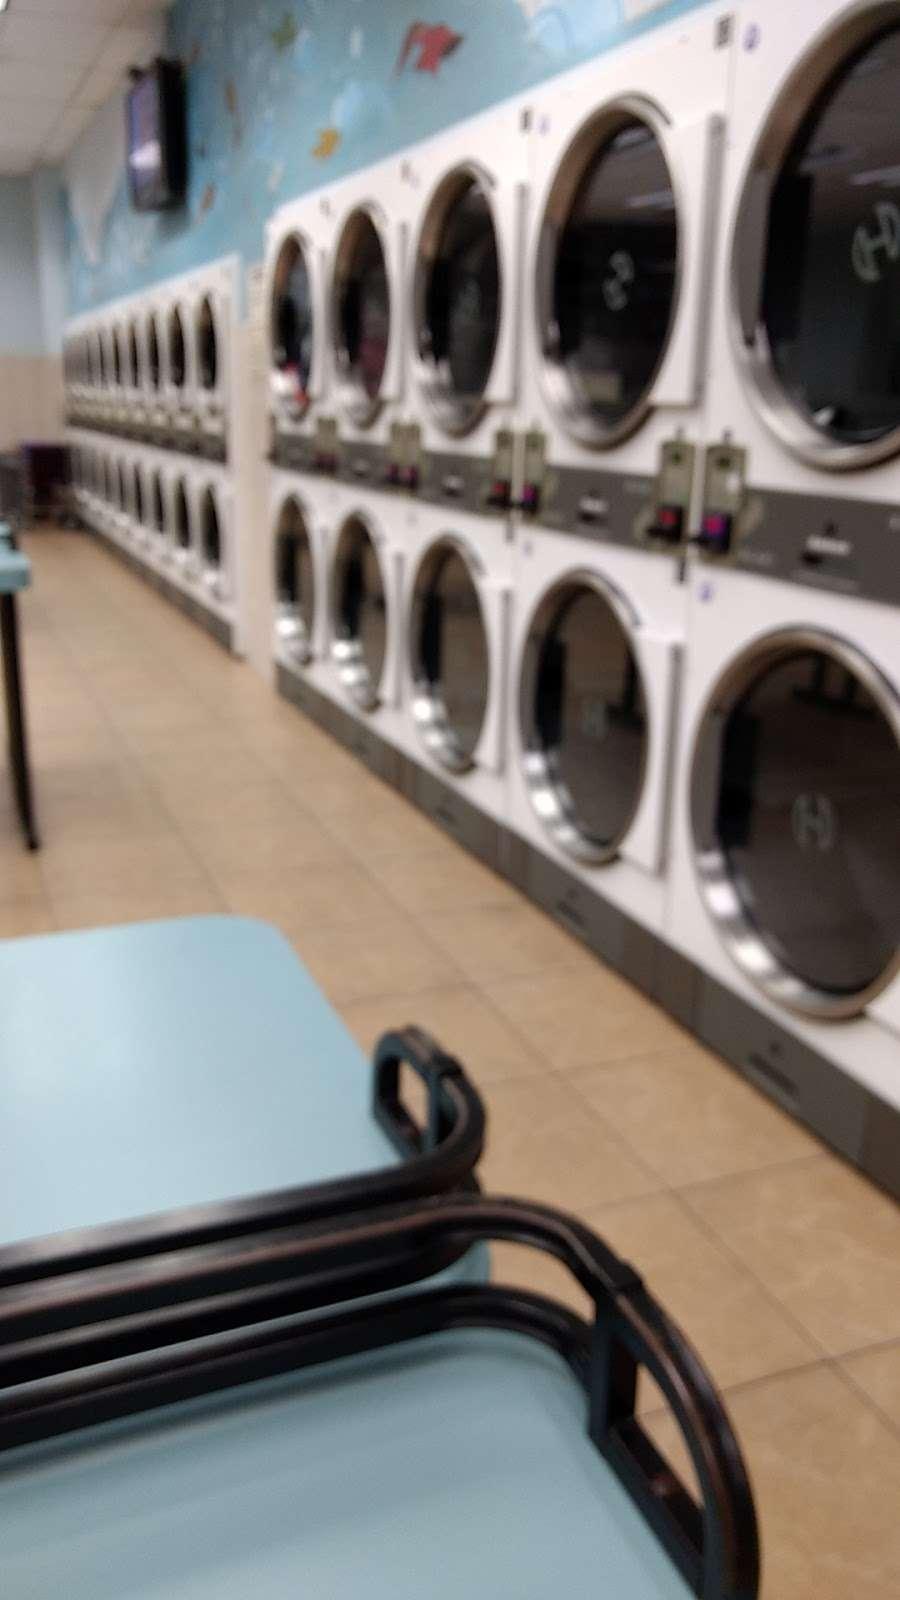 Arlington Laundromat - laundry  | Photo 2 of 5 | Address: 493 Ridge Rd, North Arlington, NJ 07031, USA | Phone: (201) 997-5757